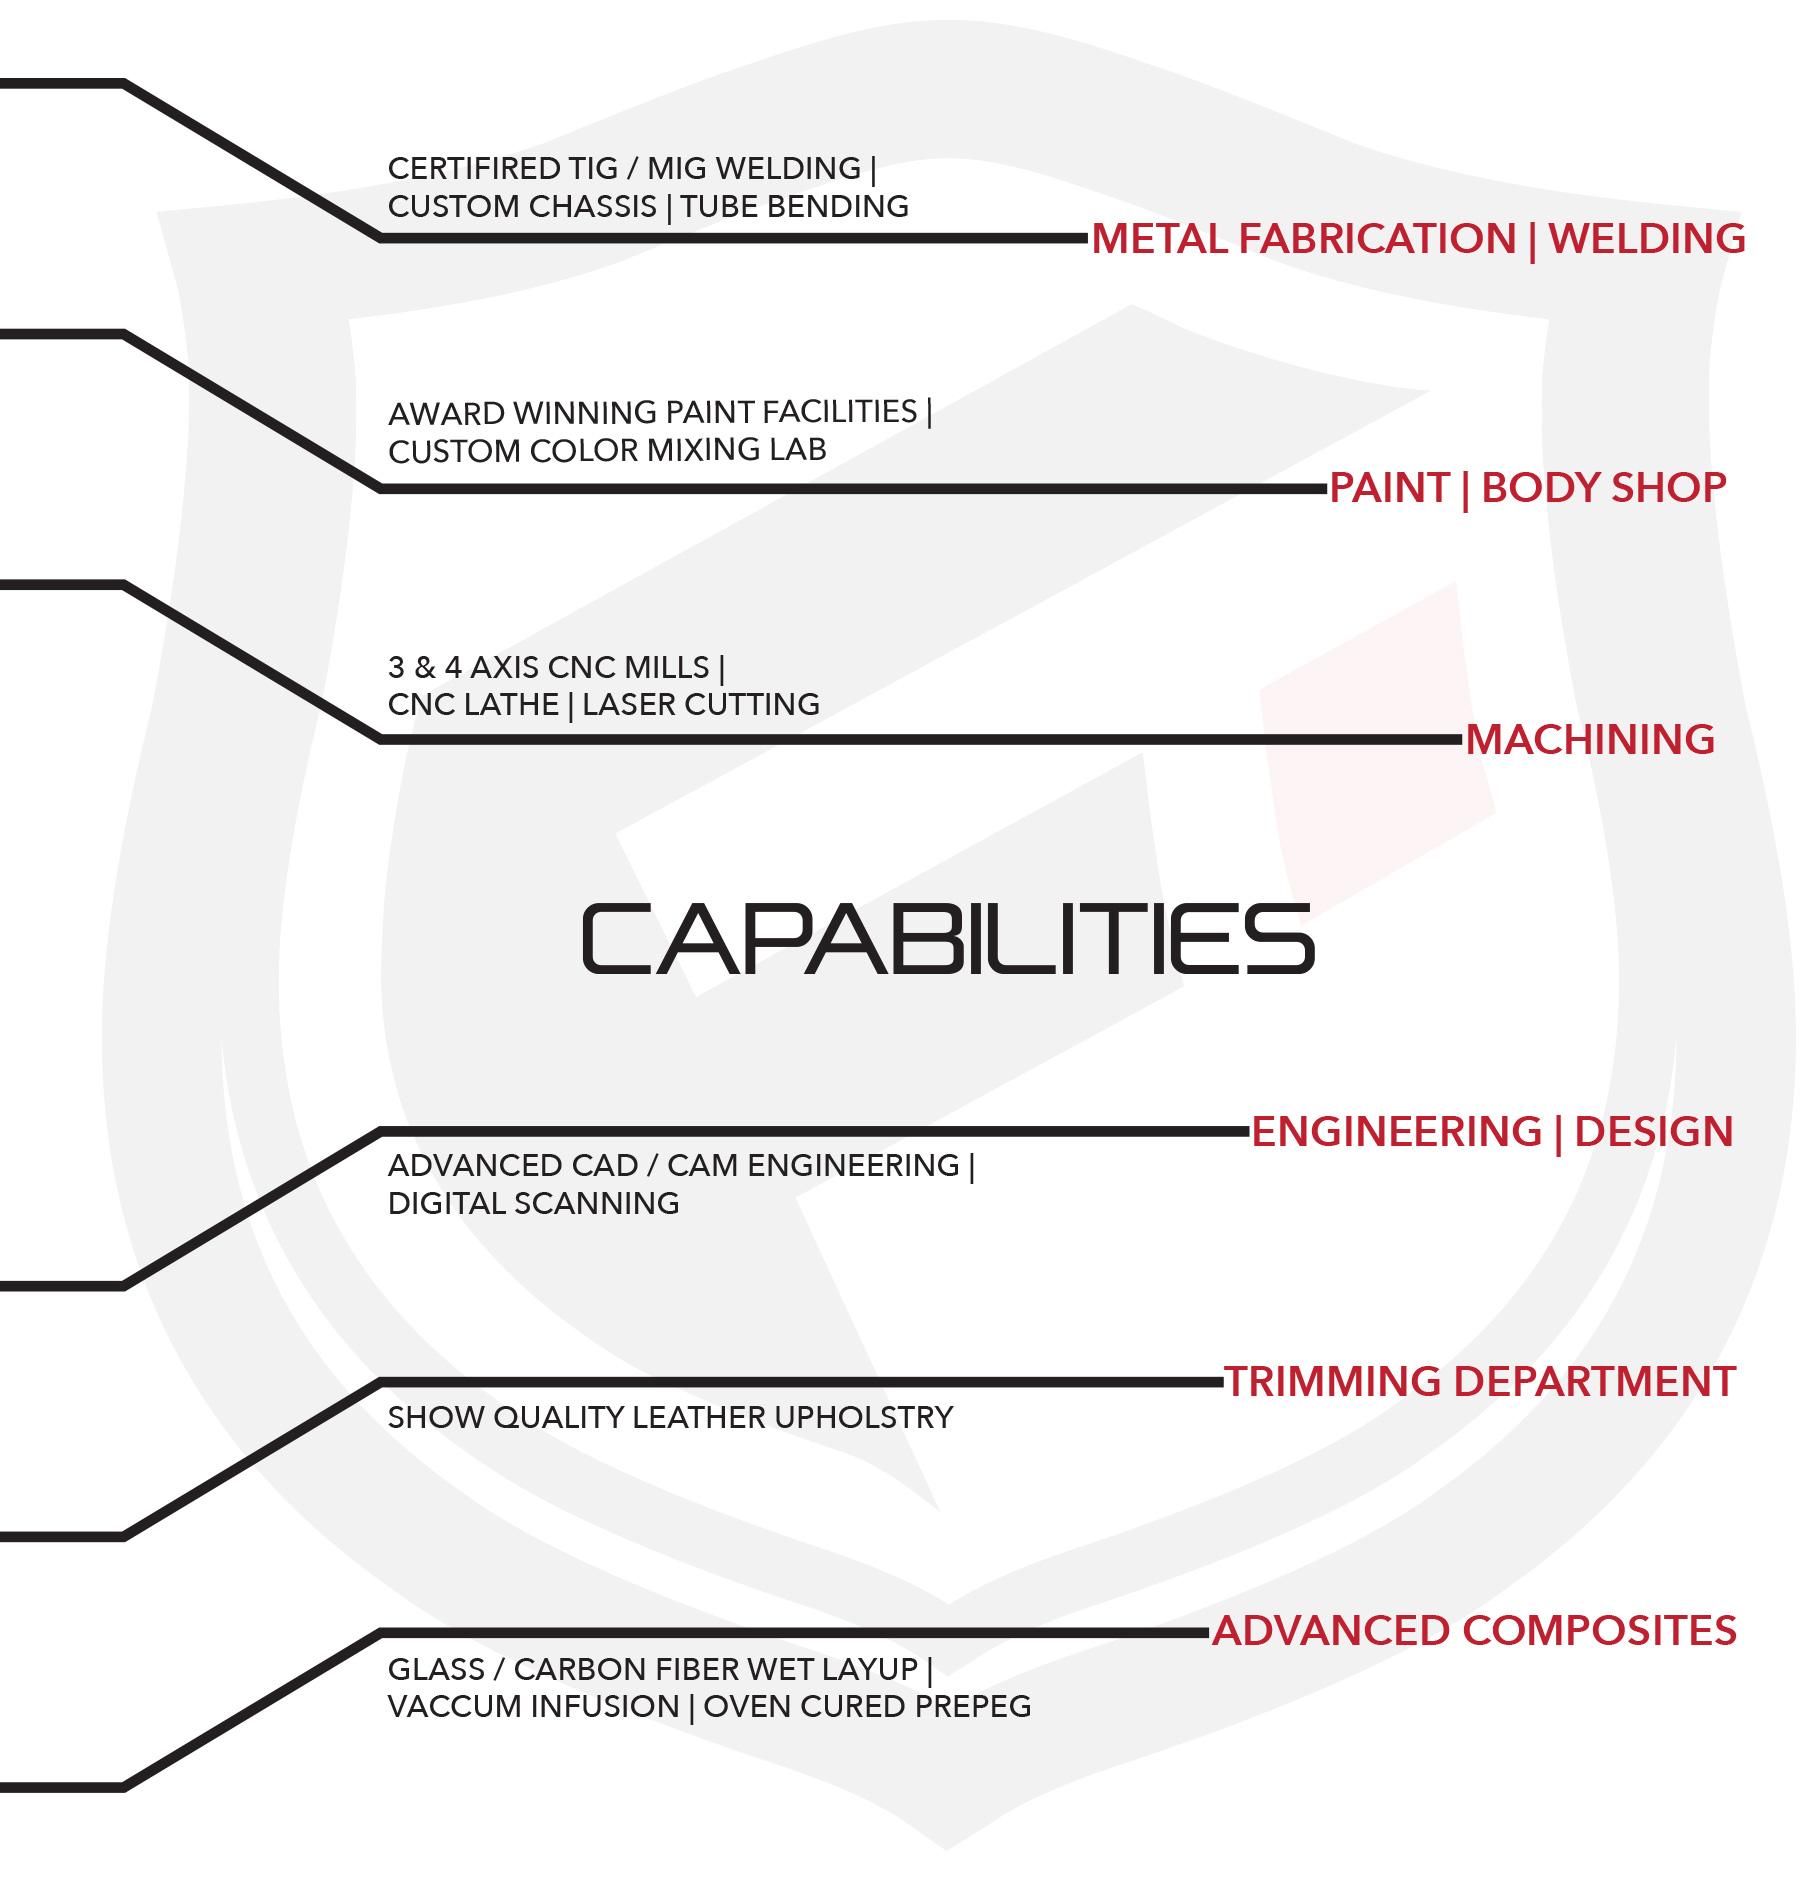 Fusion capabilities